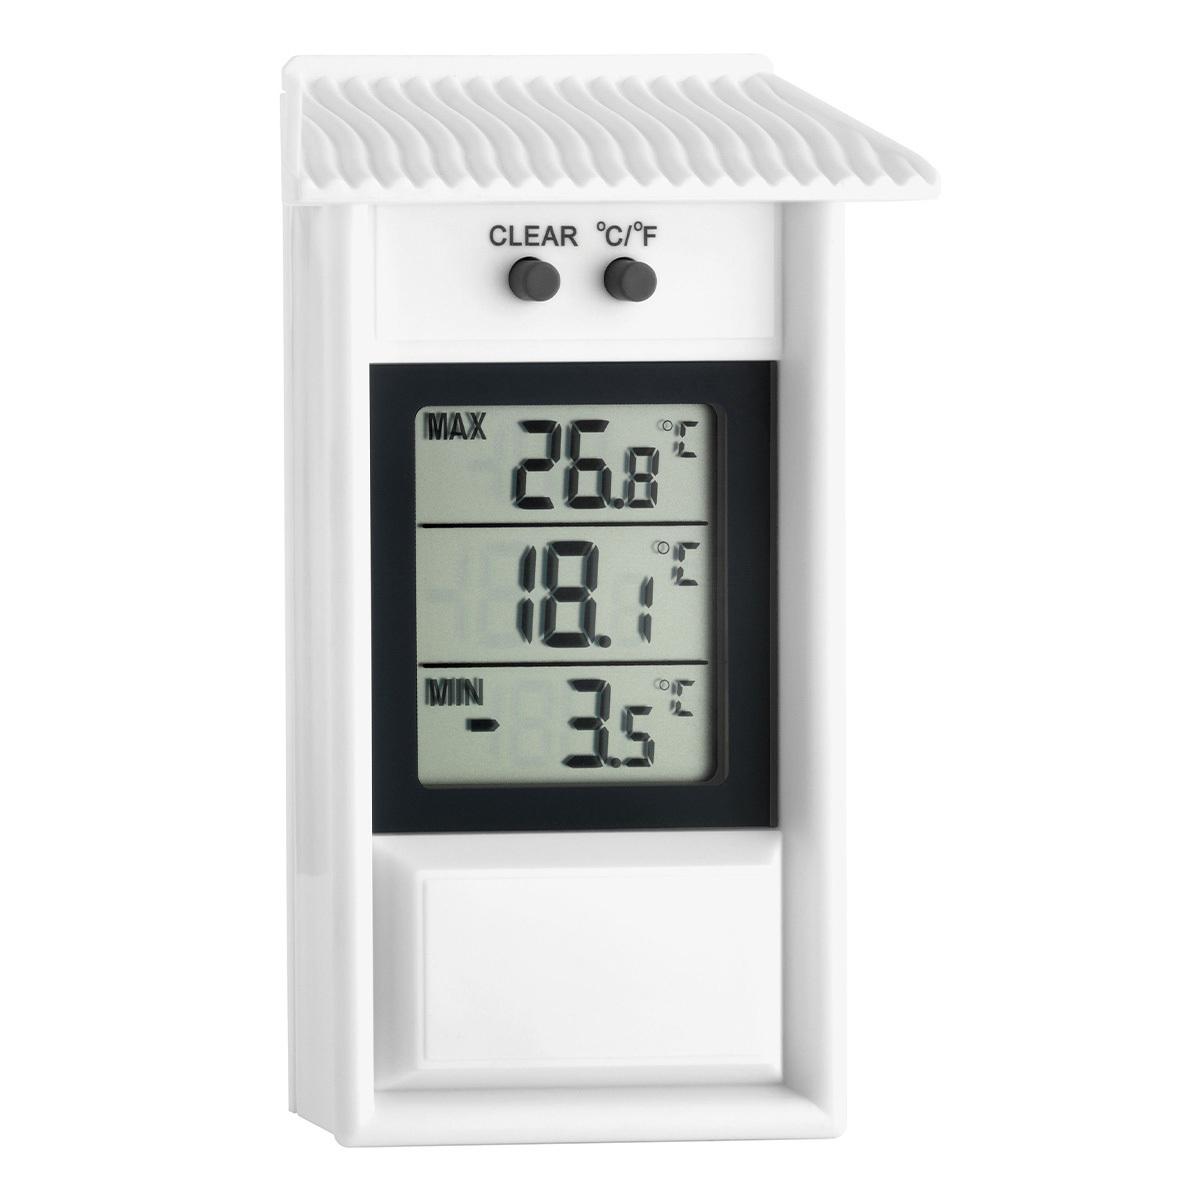 30-1053-digitales-maxima-minima-themometer-1200x1200px.jpg